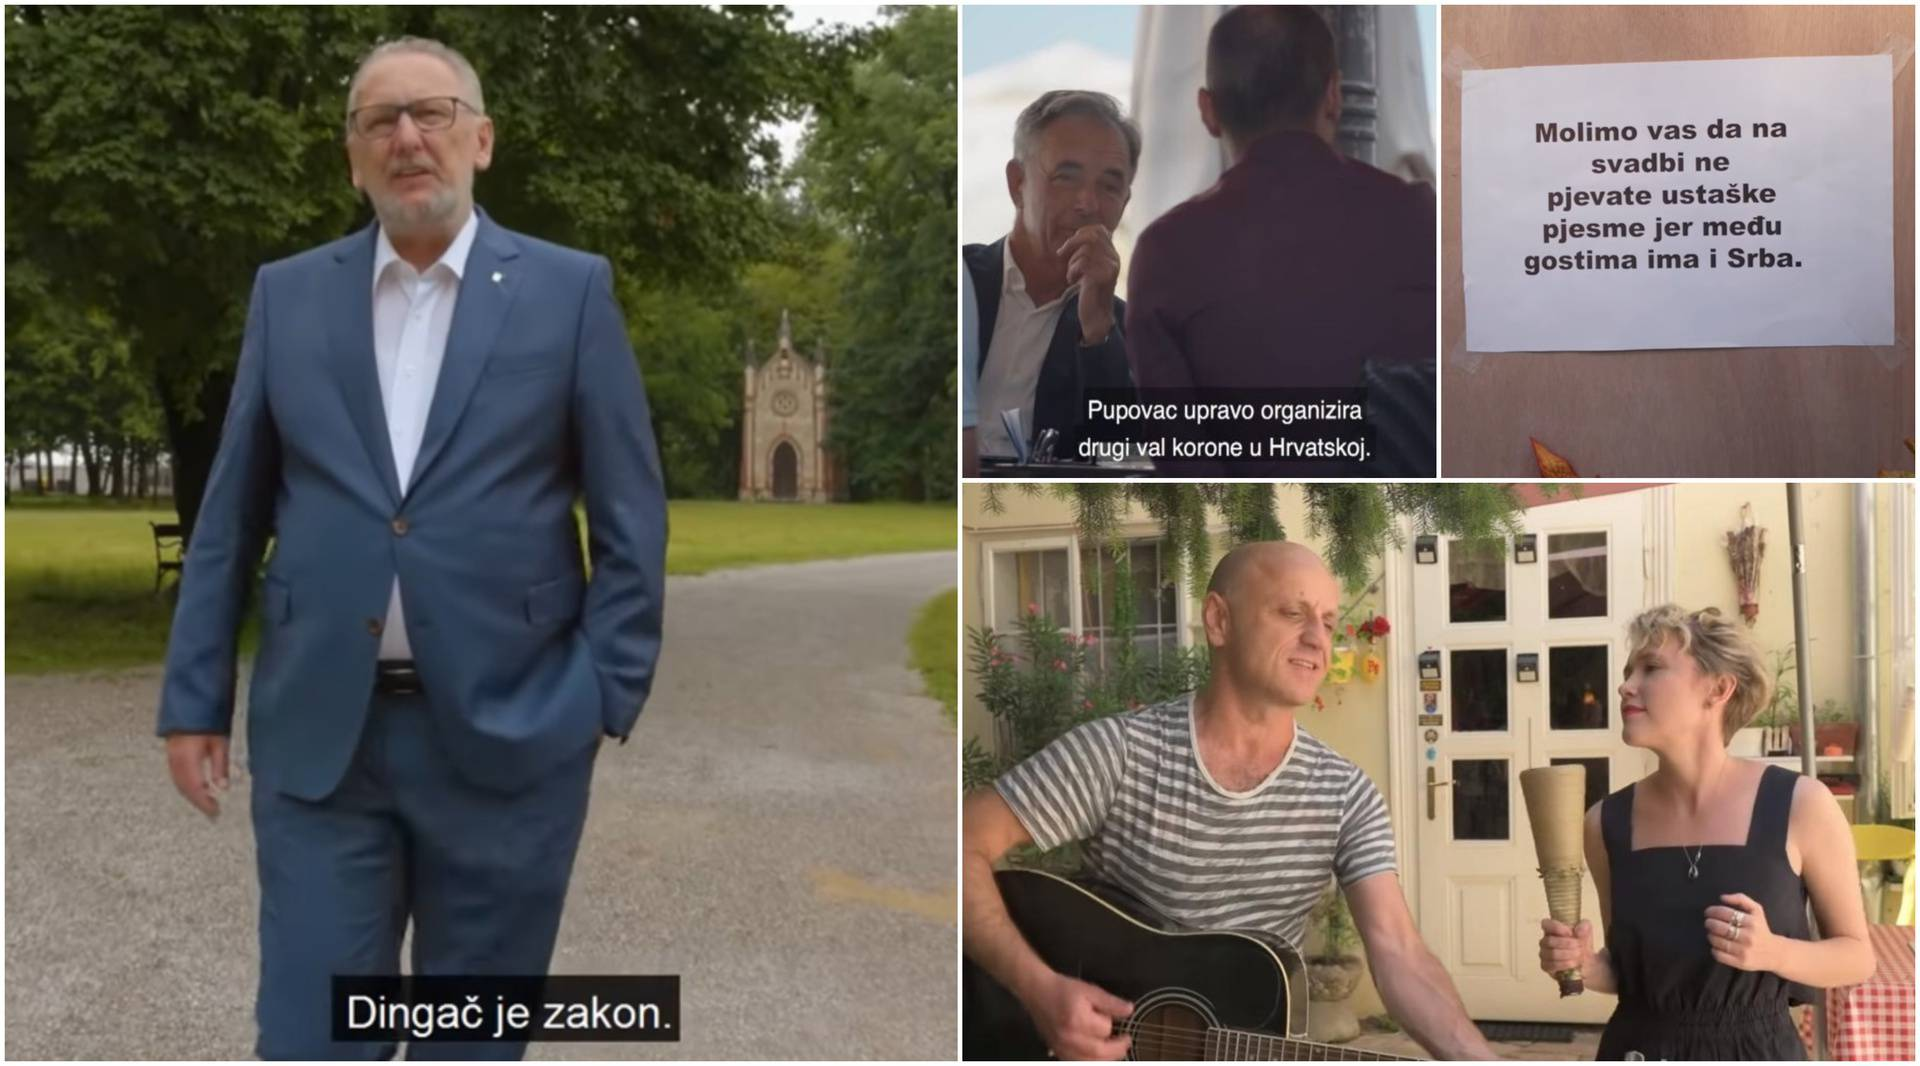 Aktualni predizborni spotovi vrijedni spomena: Pupi, HDZ osobno i Kekinovi 'sretni ljudi'